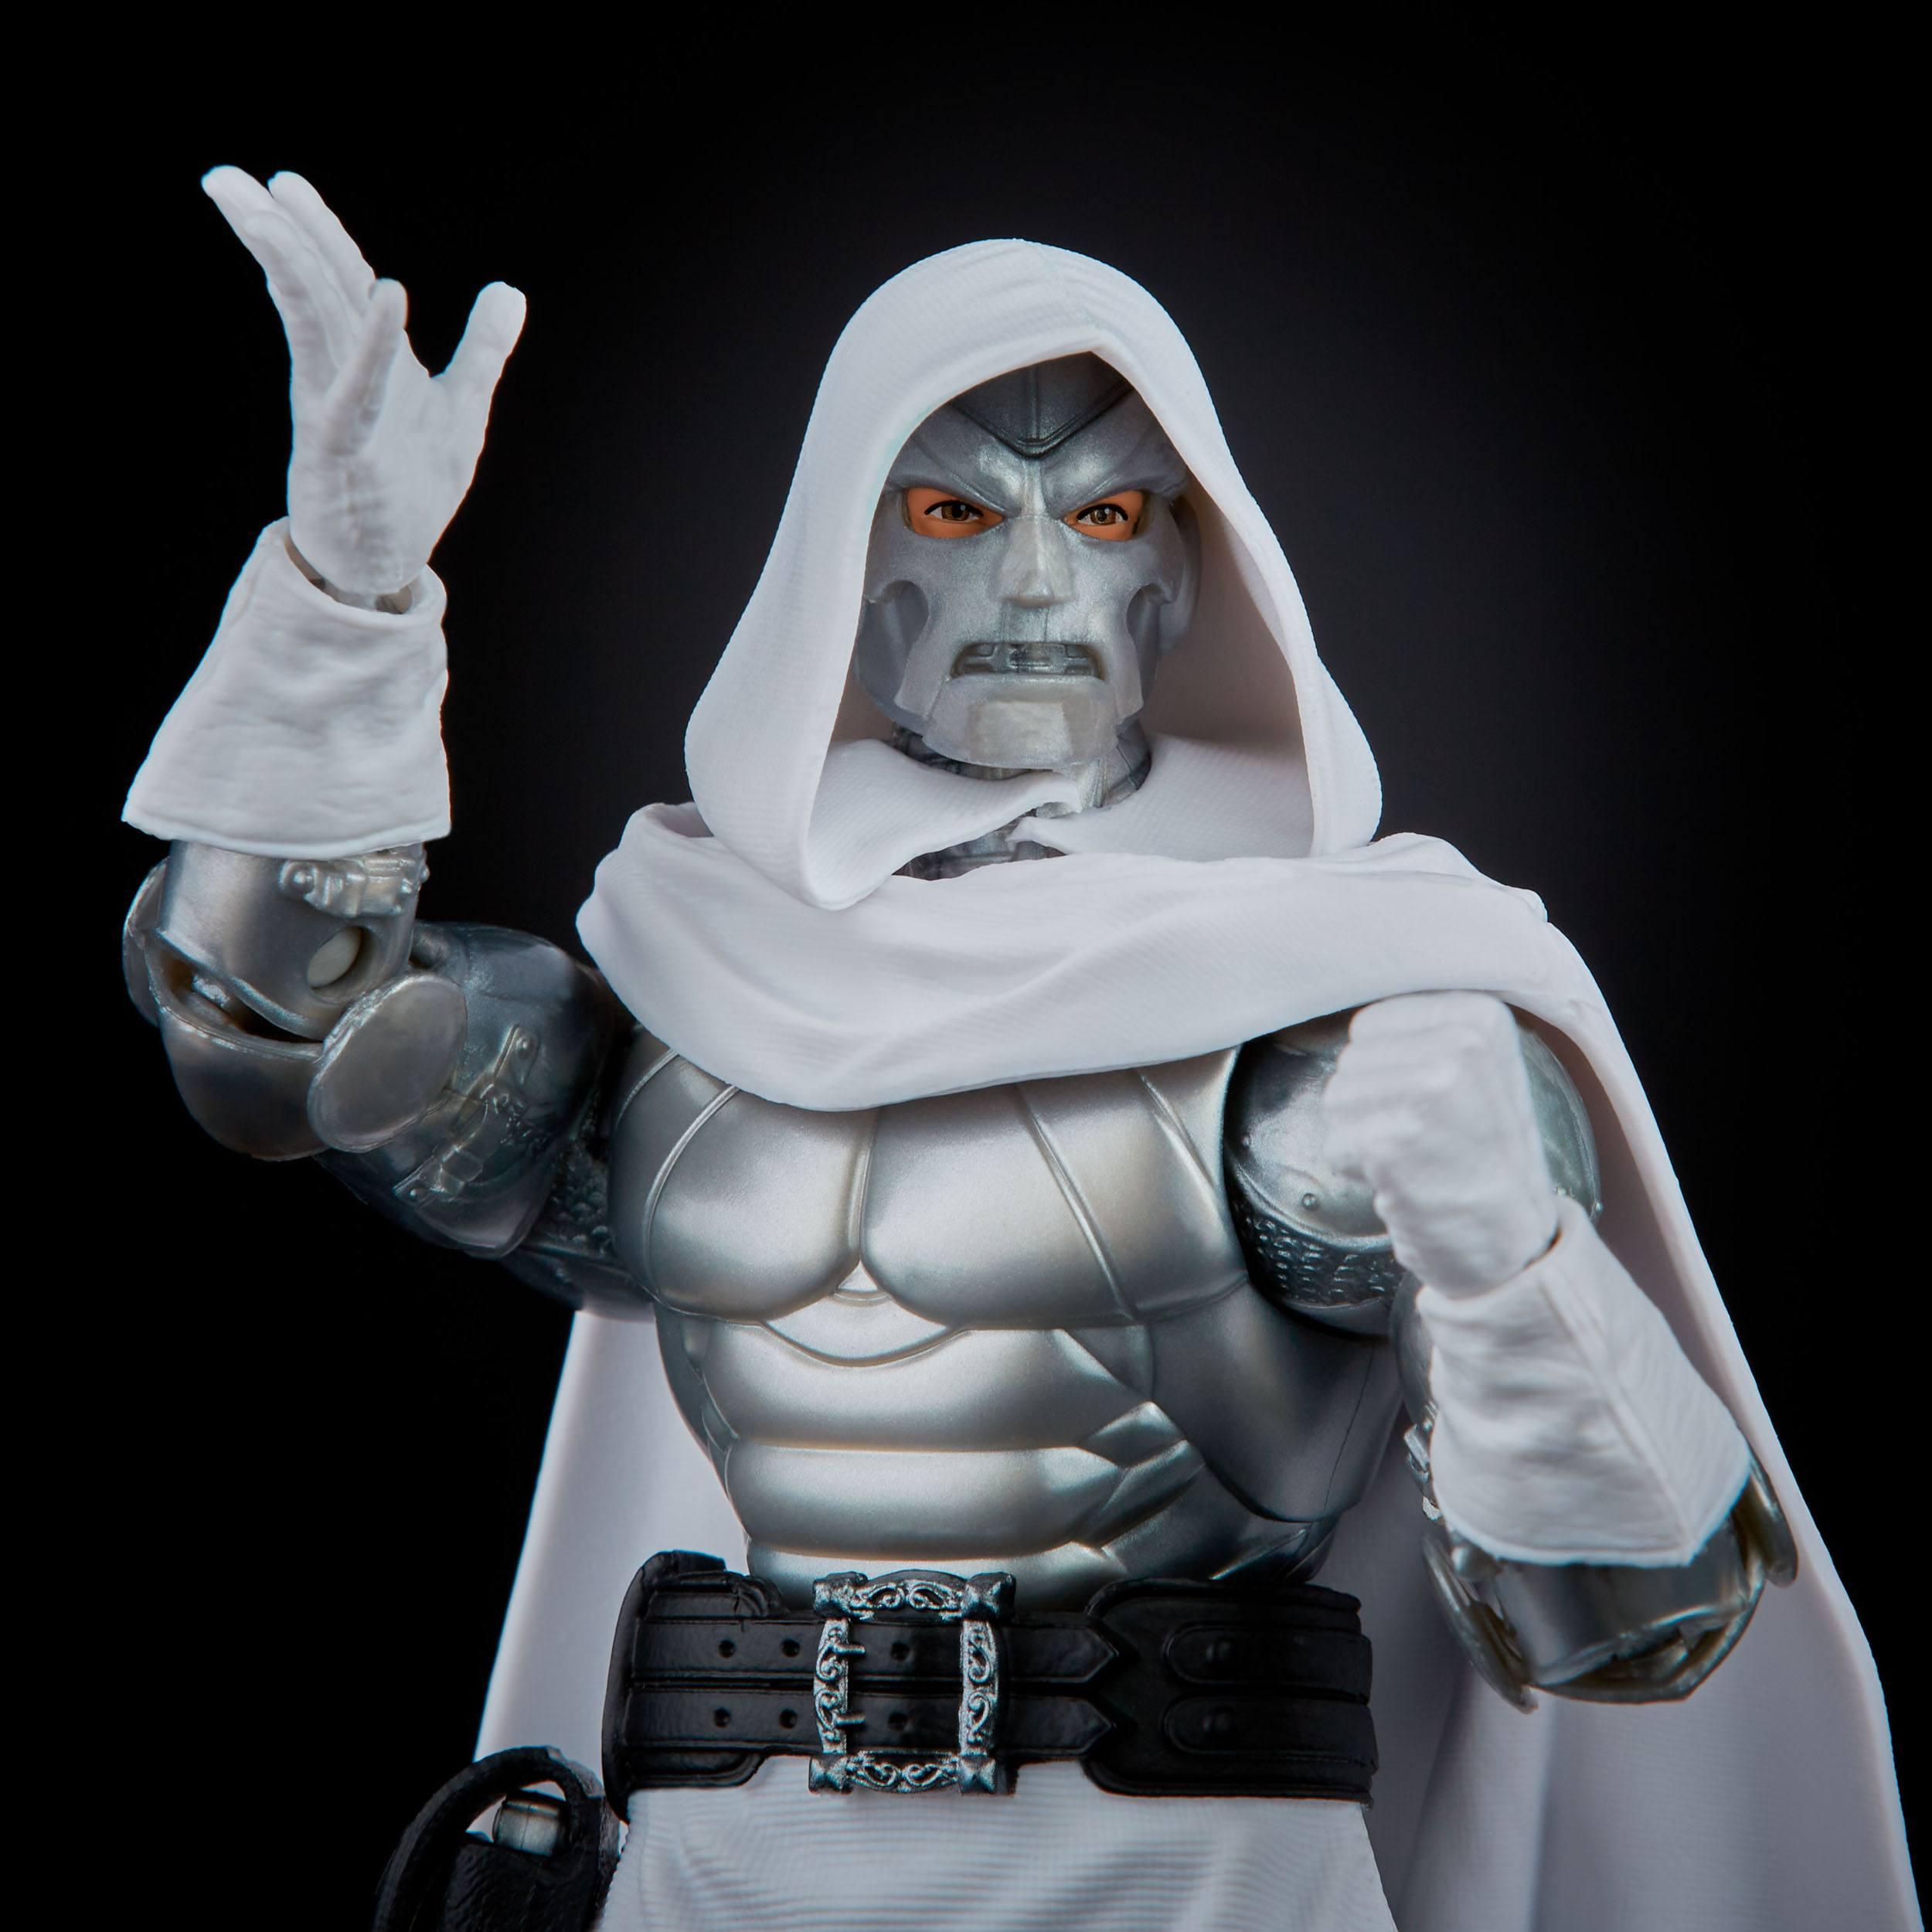 Marvel Super Villains Marvel Legends Series Actionfigur 2021 Dr. Doom 15 cm HASF2796 5010993834716